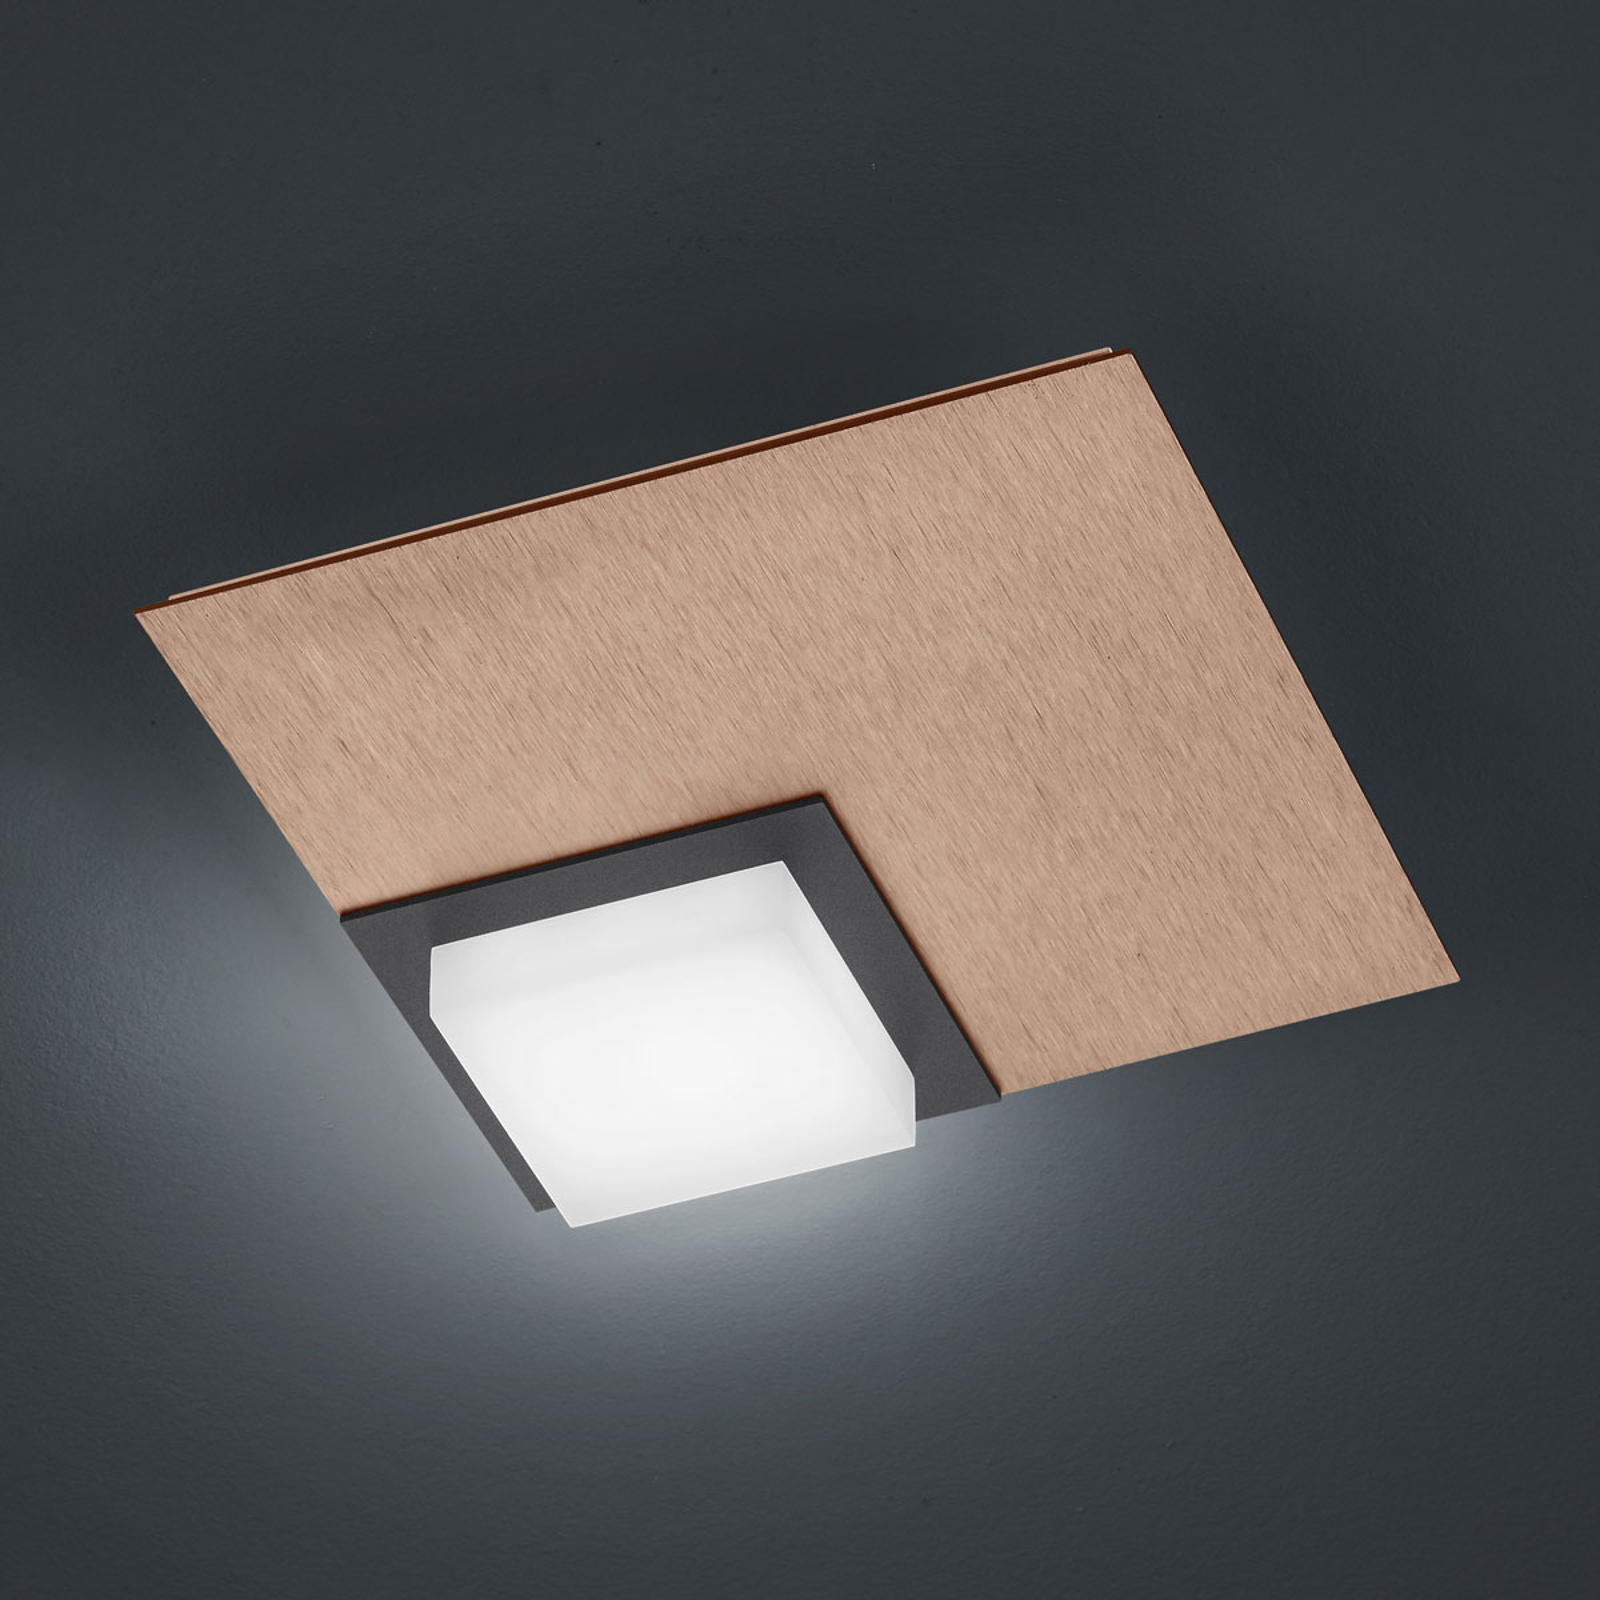 BANKAMP Quadro LED-Deckenleuchte 8W roségold